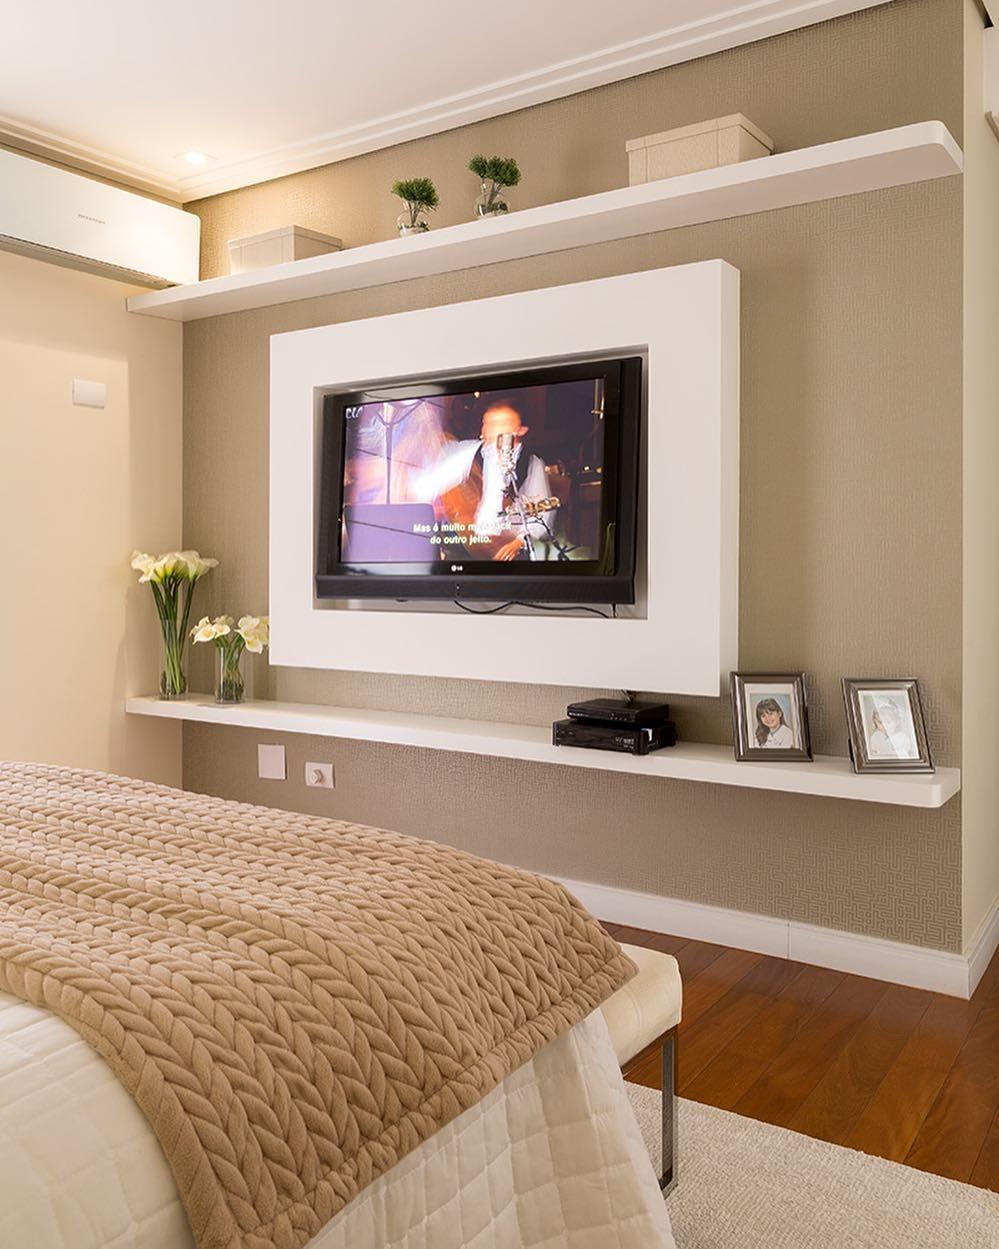 Pin de Πηνελοπη Τσαγγετα en sweet home | Pinterest | Dormitorio ...